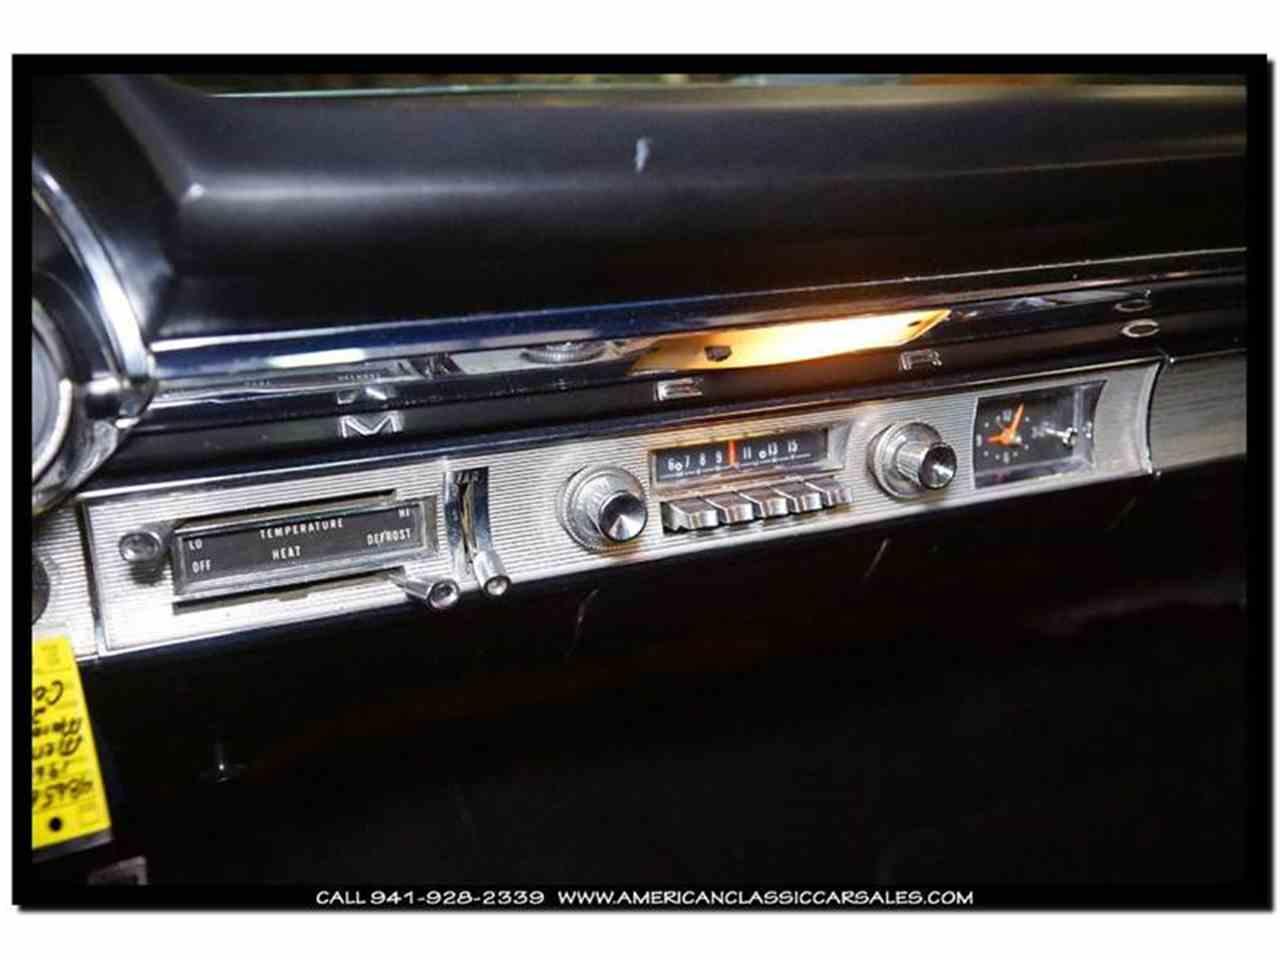 Large Picture of Classic 1964 Mercury Monterey located in Sarasota Florida - $12,620.00 - FJWV